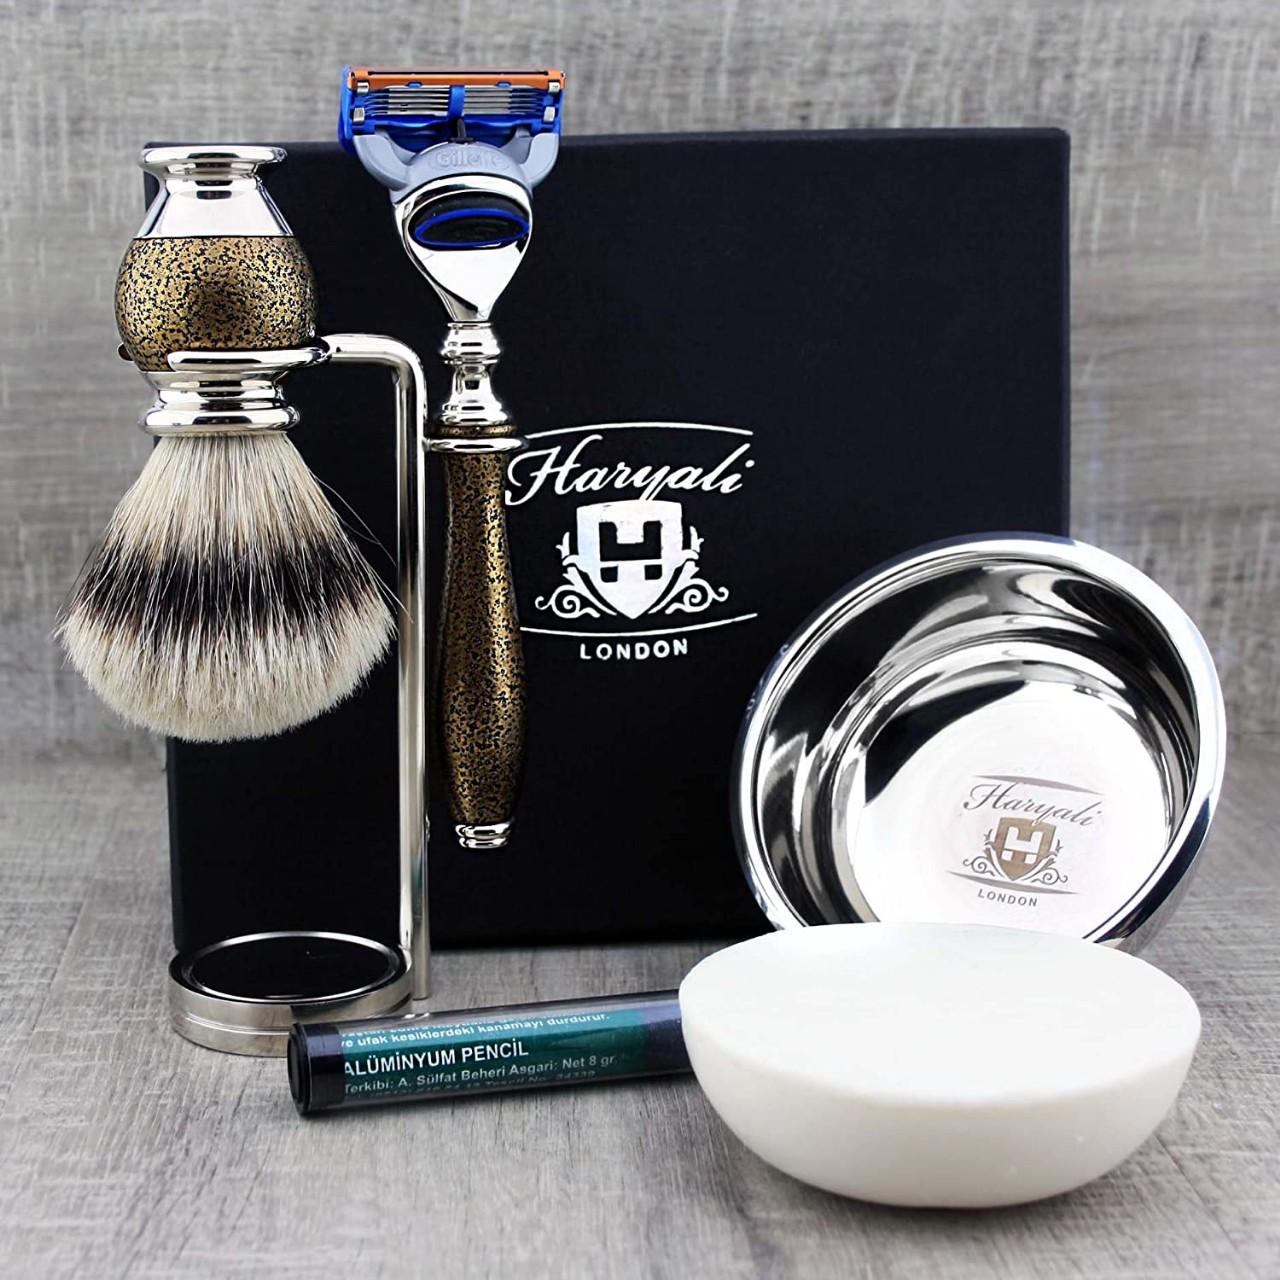 Haryali London 6 Pc Mens Shaving Kit 5 Edge Razor With Silver Tip Badger Hair Shaving Brush, Stand